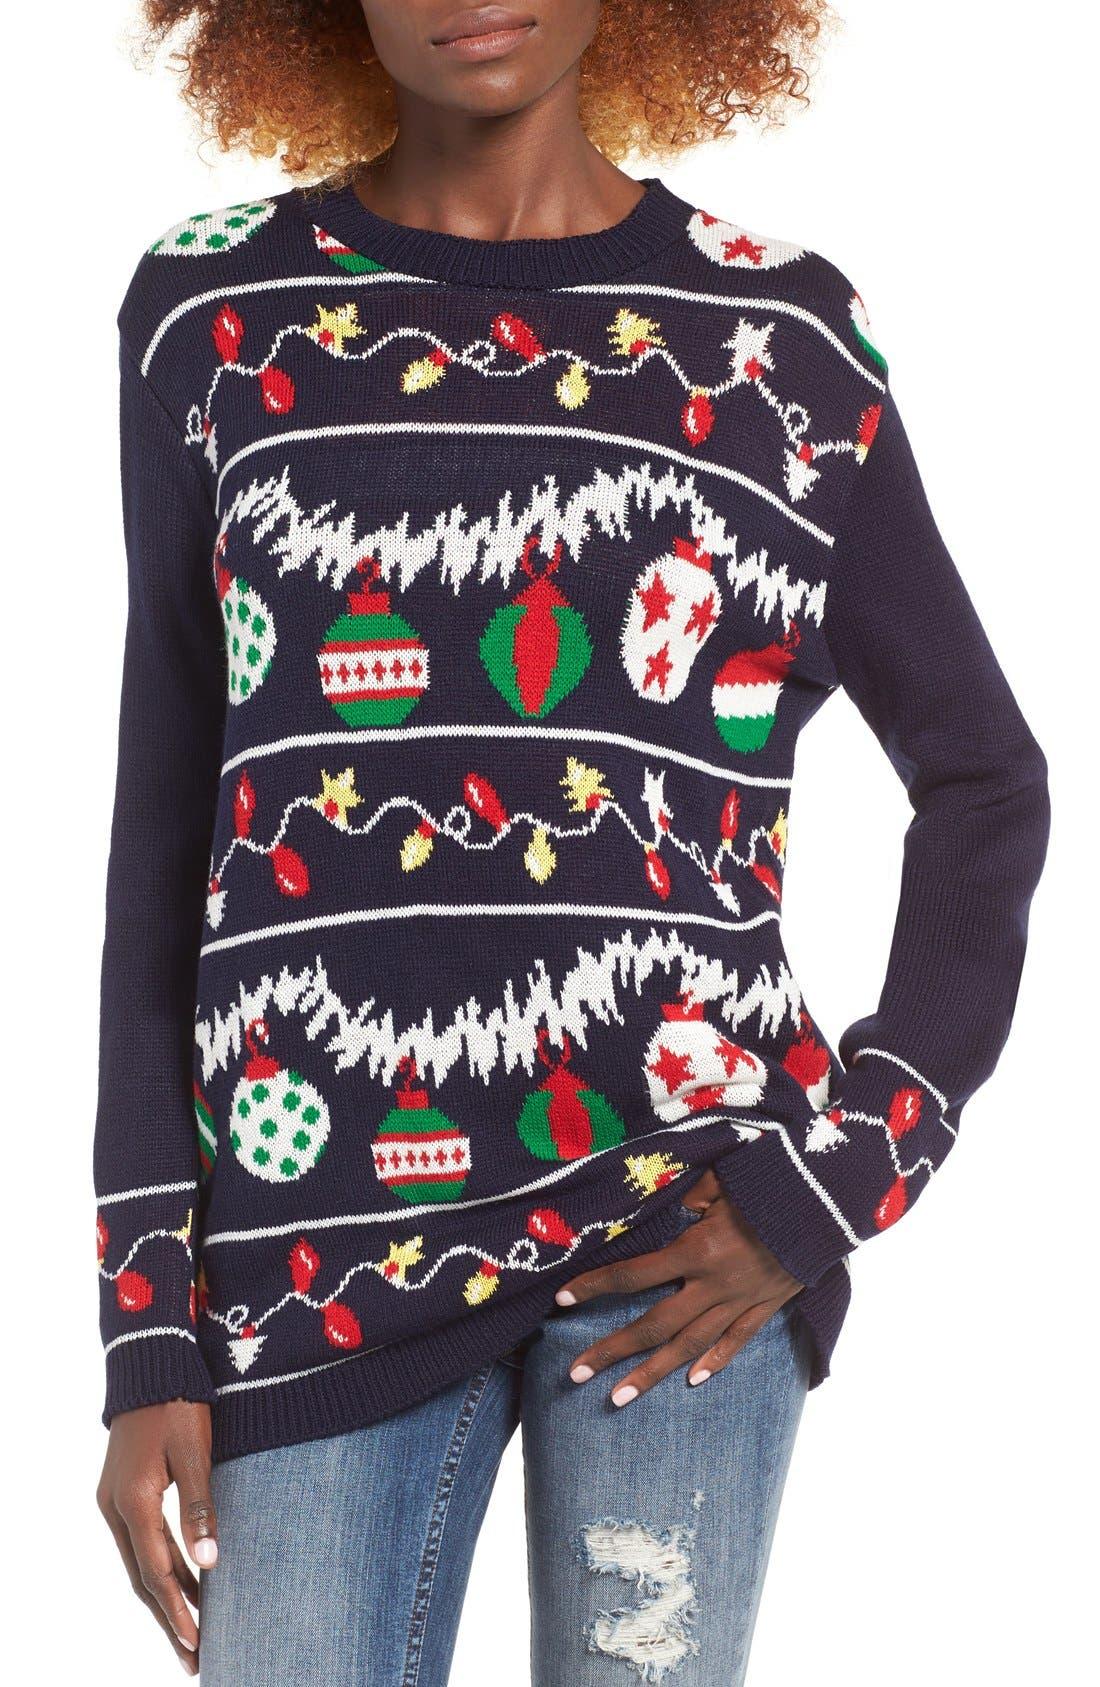 Alternate Image 1 Selected - Cotton Emporium Ornament Christmas Sweater